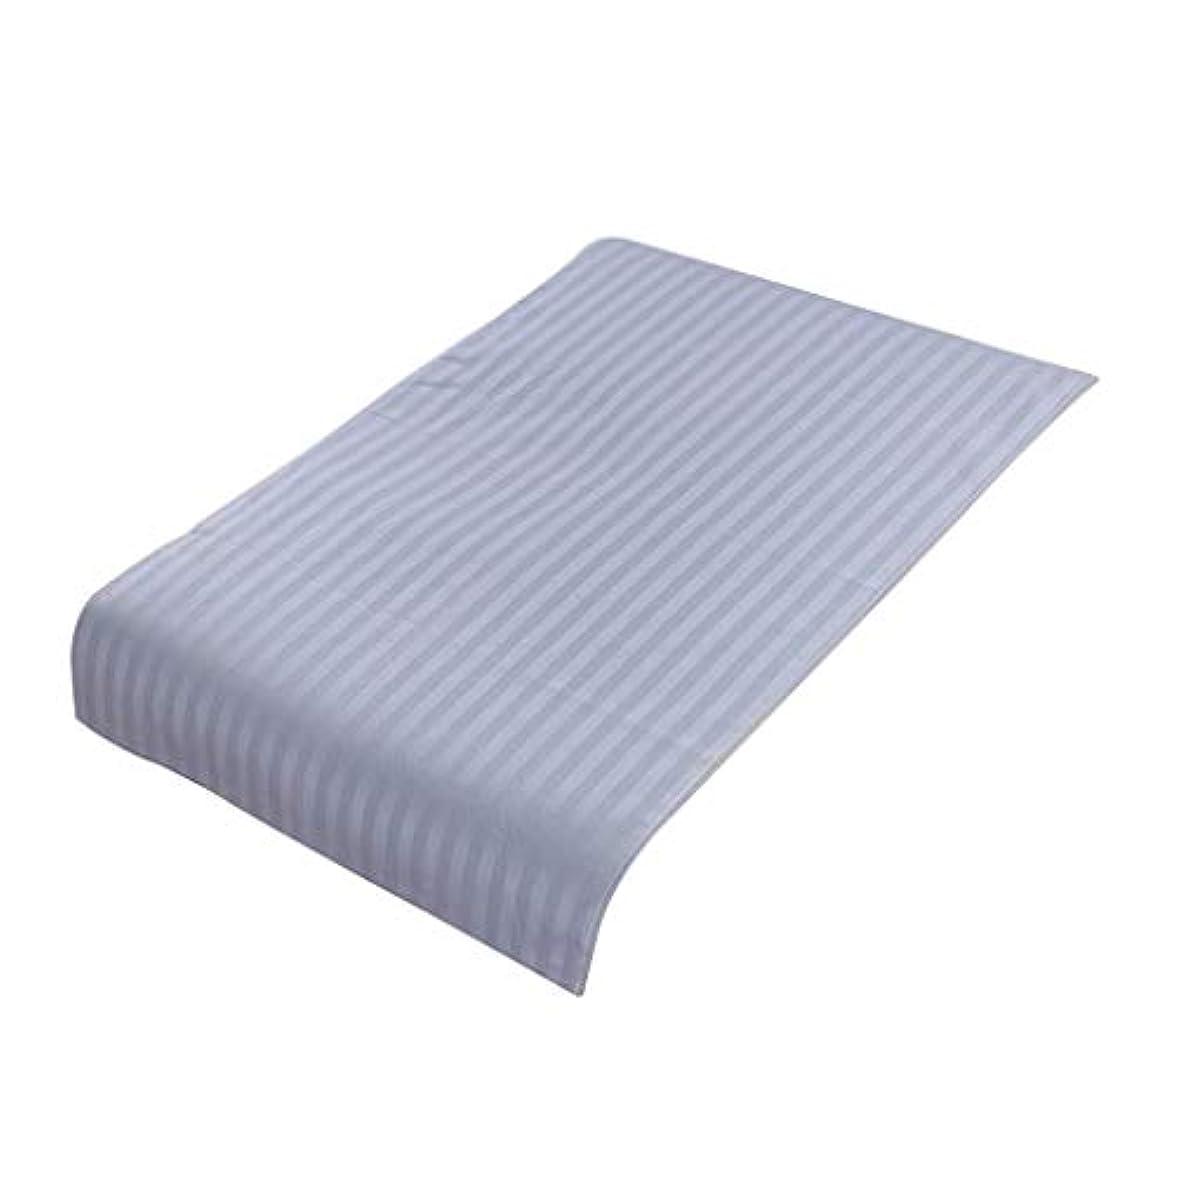 PETSOLA 美容院ベッドカバー 断面 スパ マッサージベッドスカート ピュアコットン 快適 (90×60cm) - ライトブルー